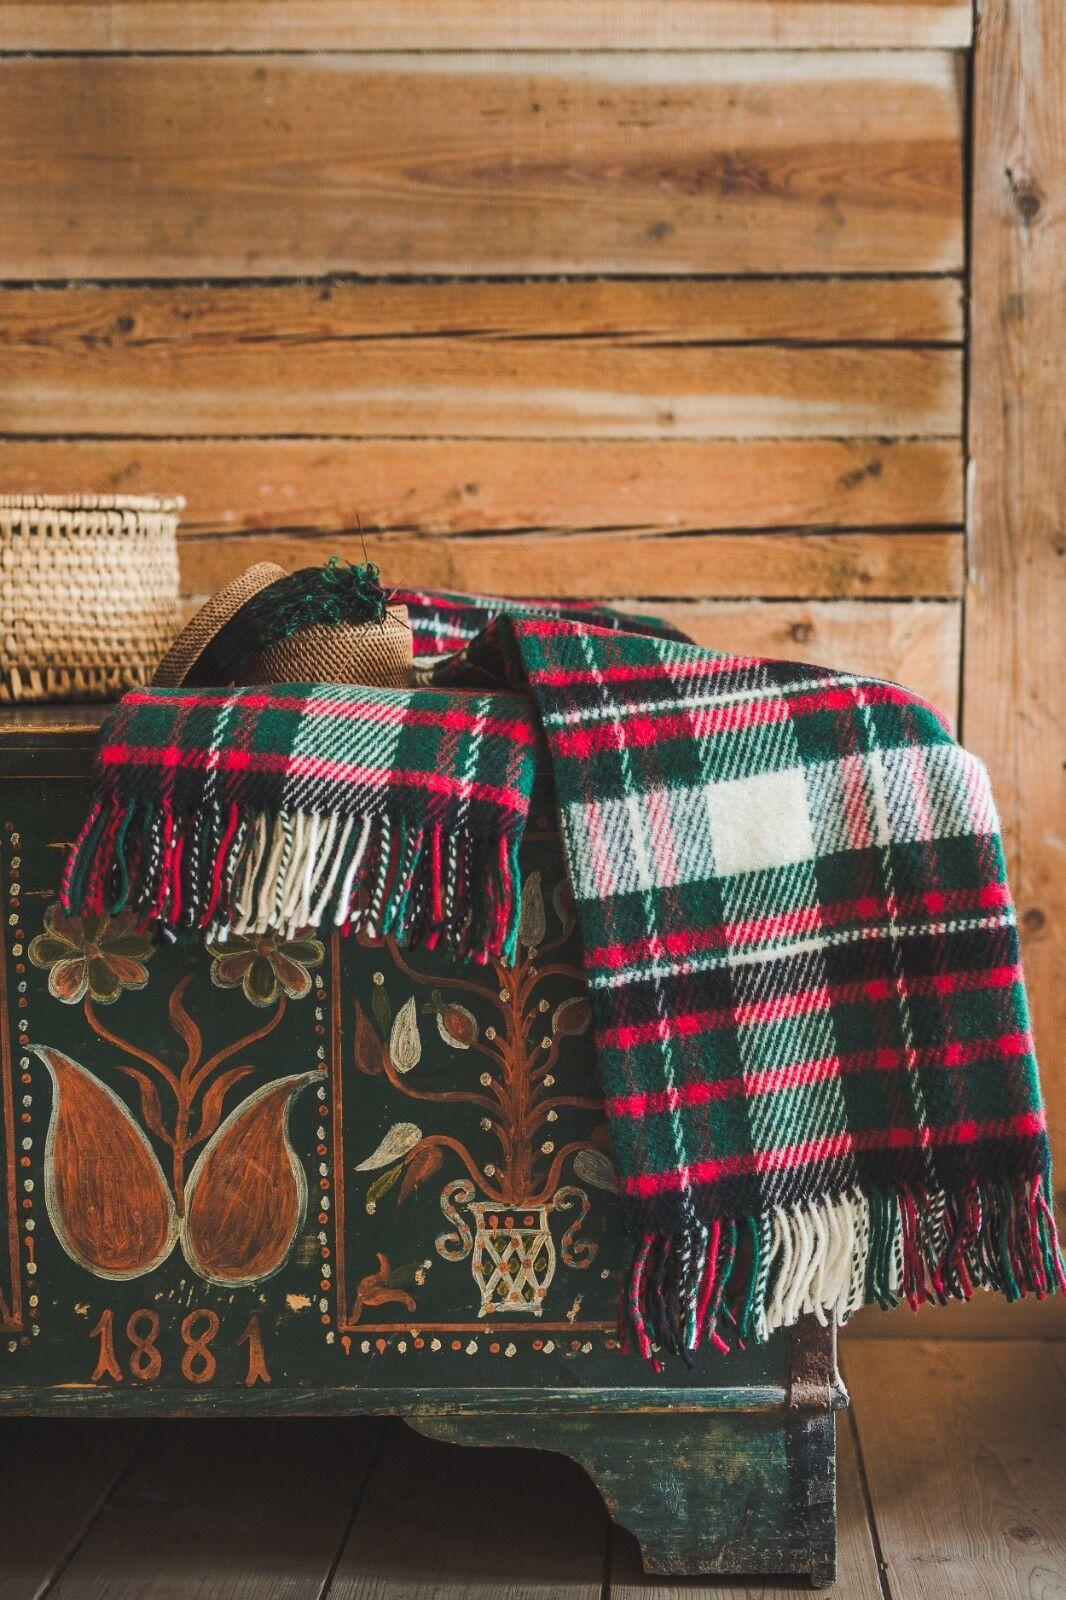 Blanket Throw Bed Sofa Fleece Cozy Plaid Soft Warm 100% Wool 130x210cm Scottish